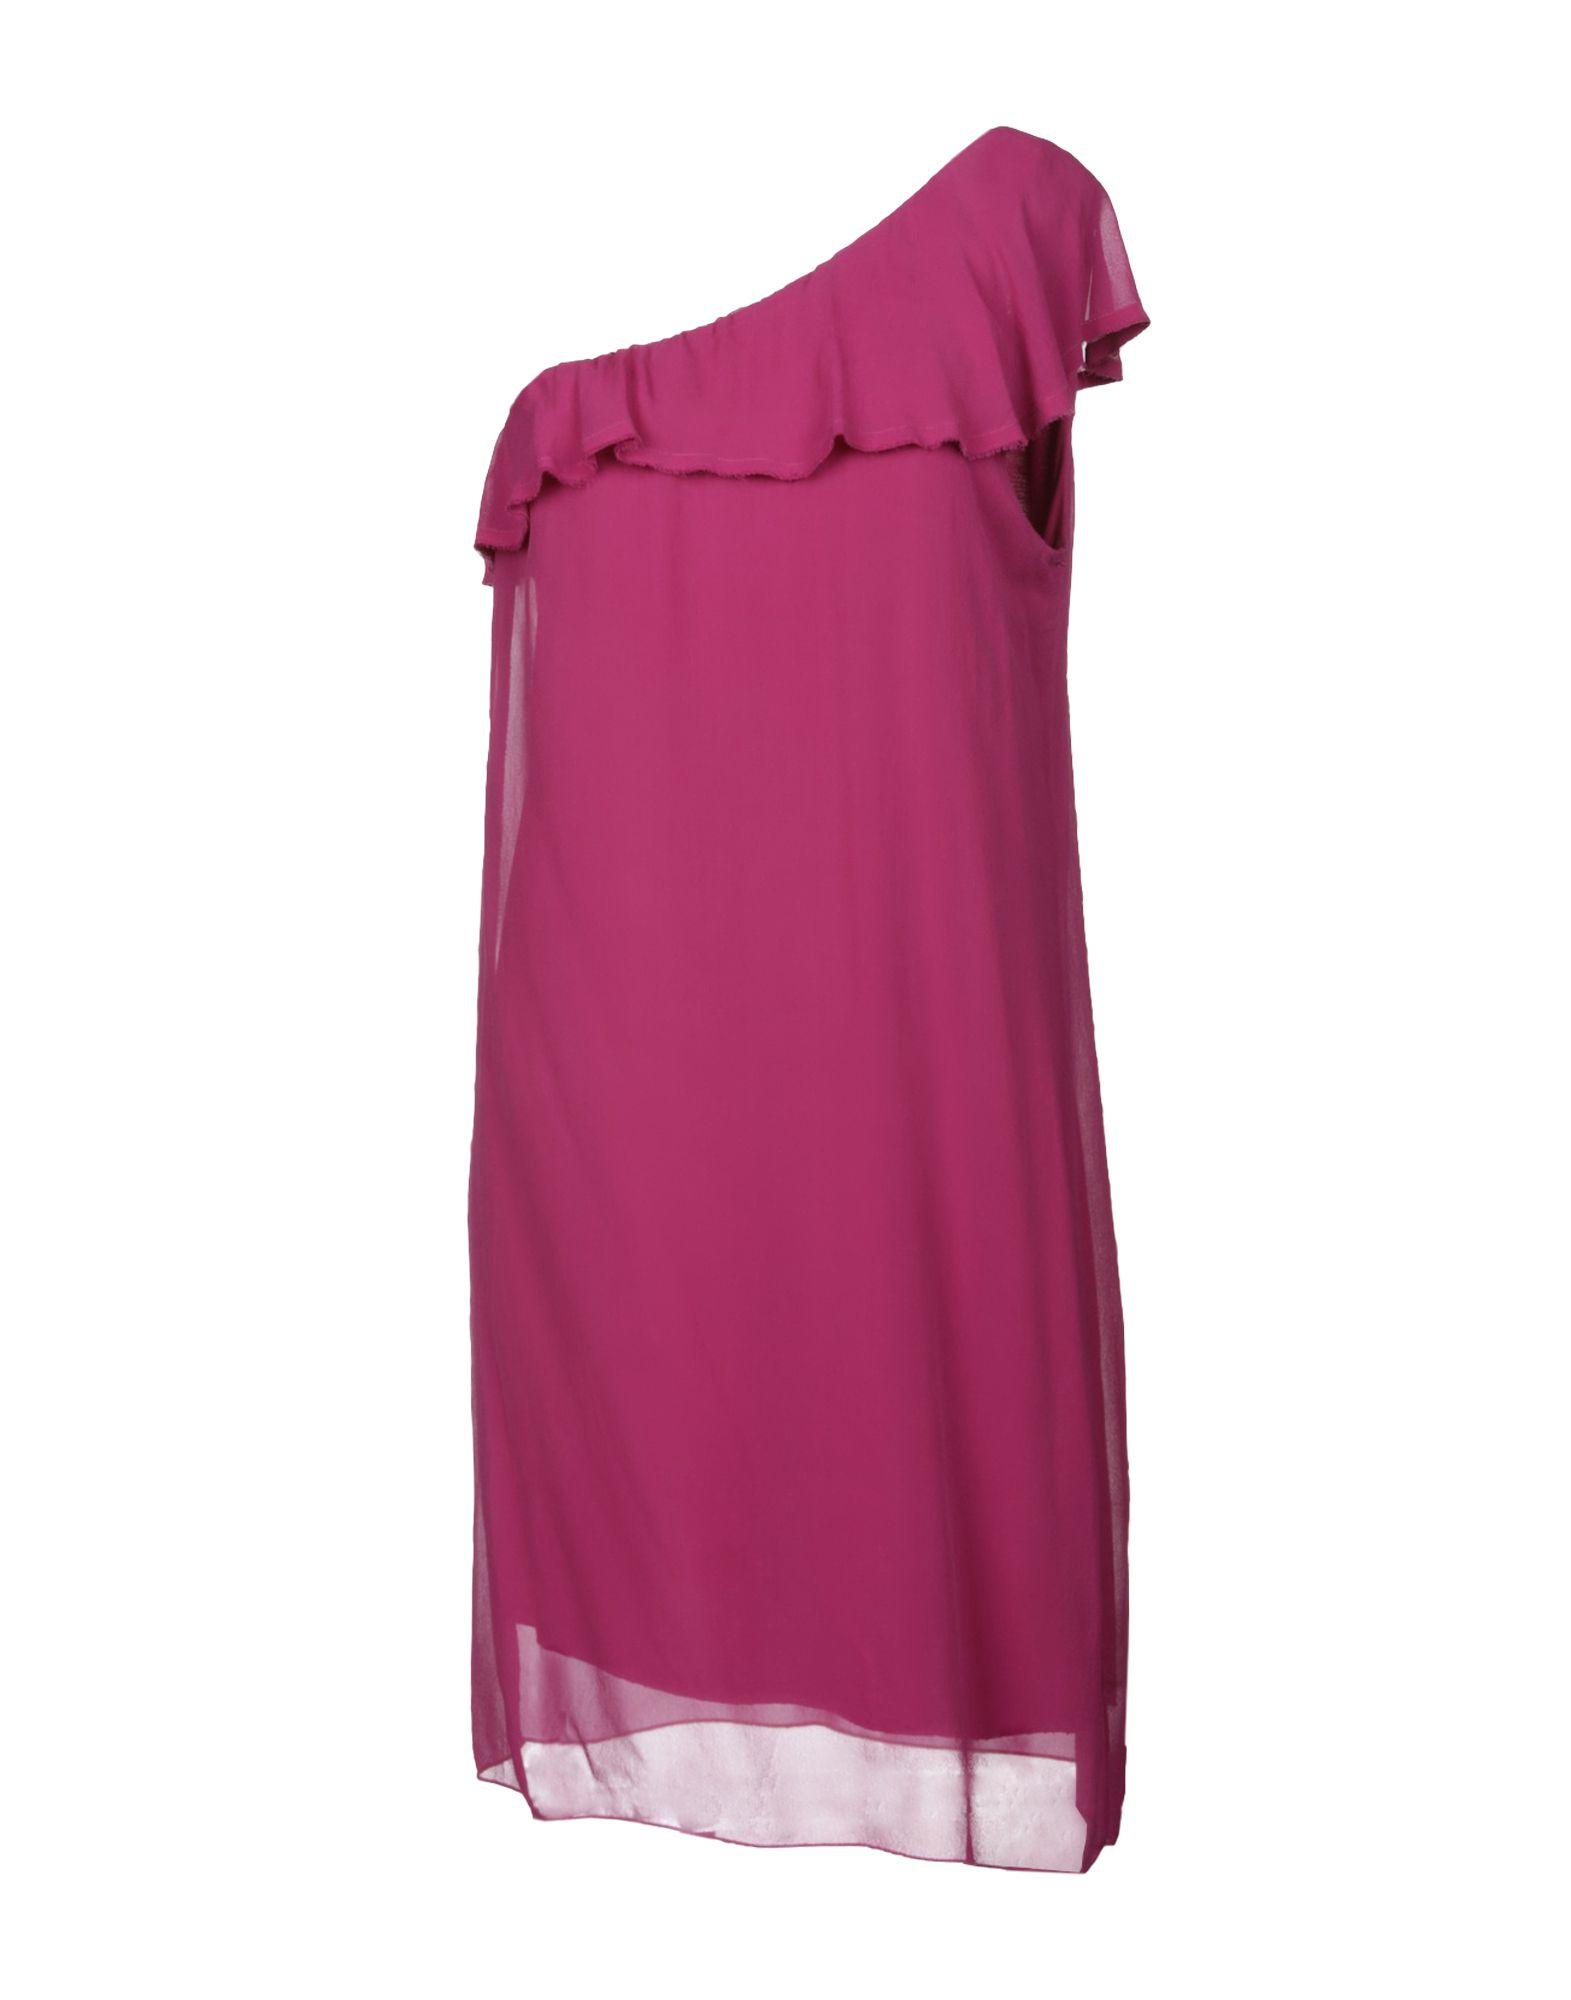 MASSIMO REBECCHI Короткое платье massimo rebecchi tdm платье до колена